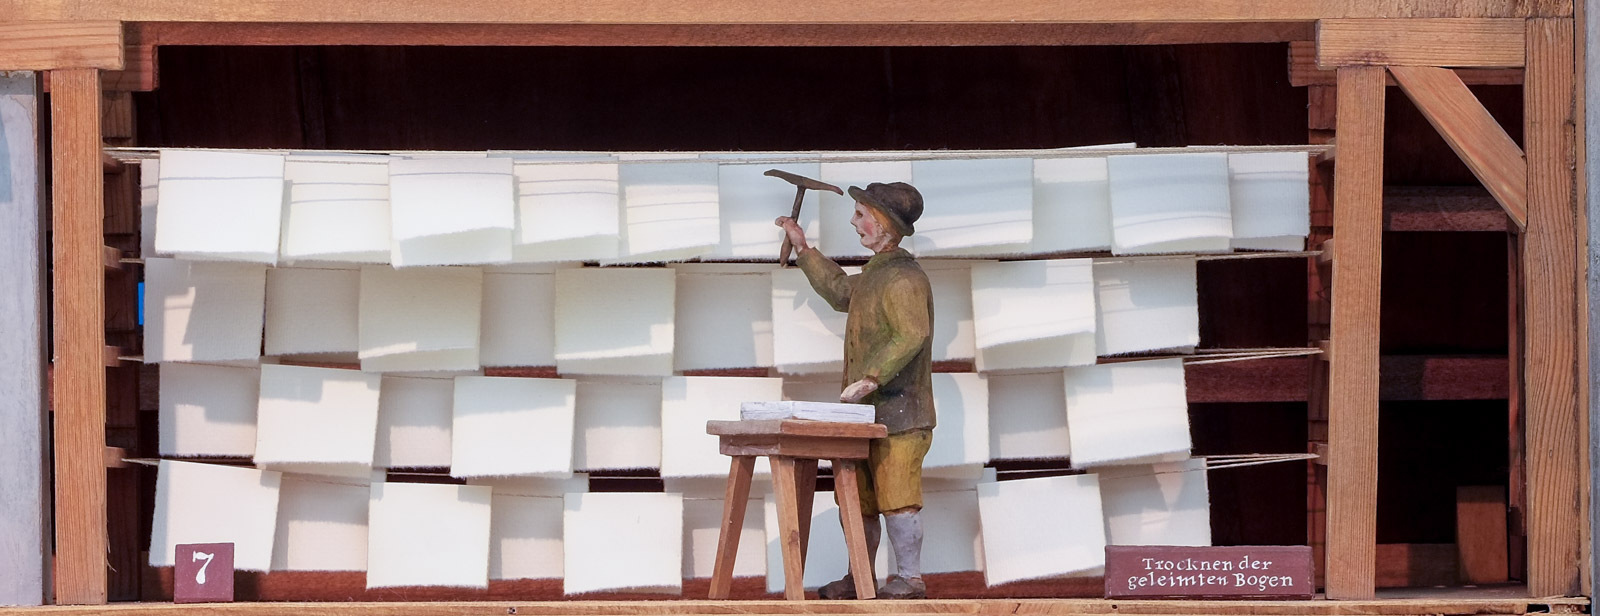 Papiermühle: Trocknen der geleimten Bogen